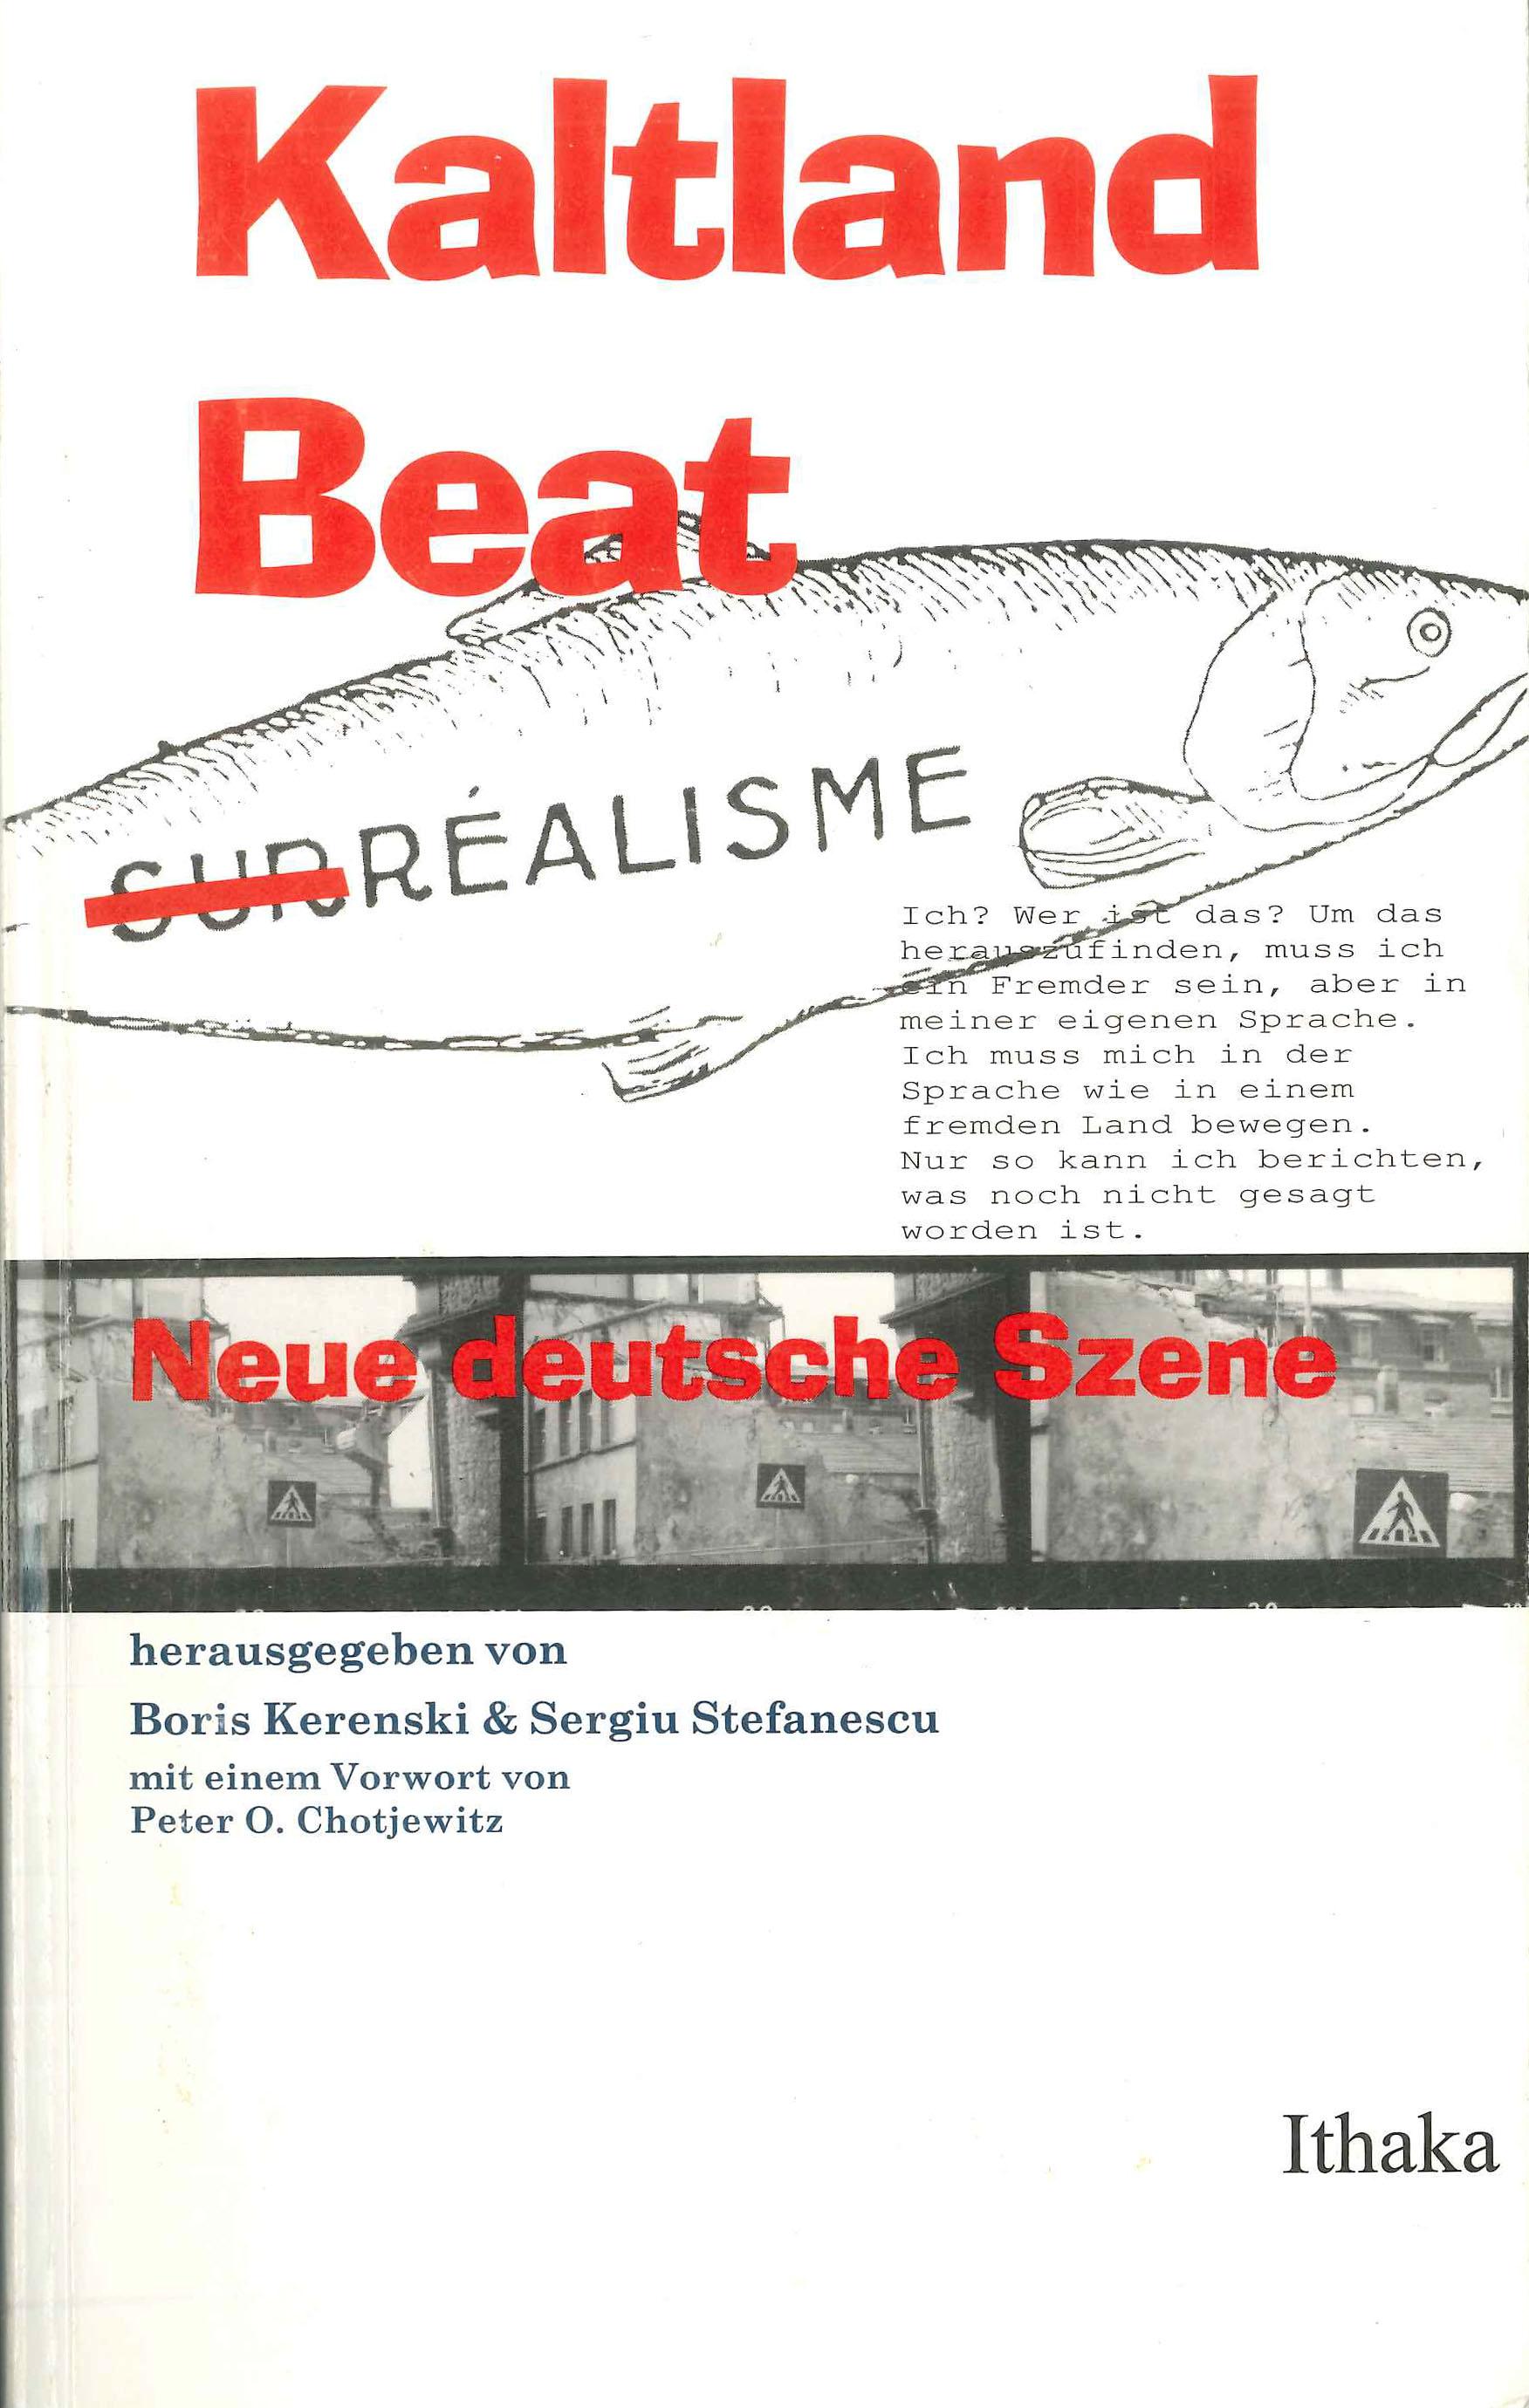 Kaltland Beat